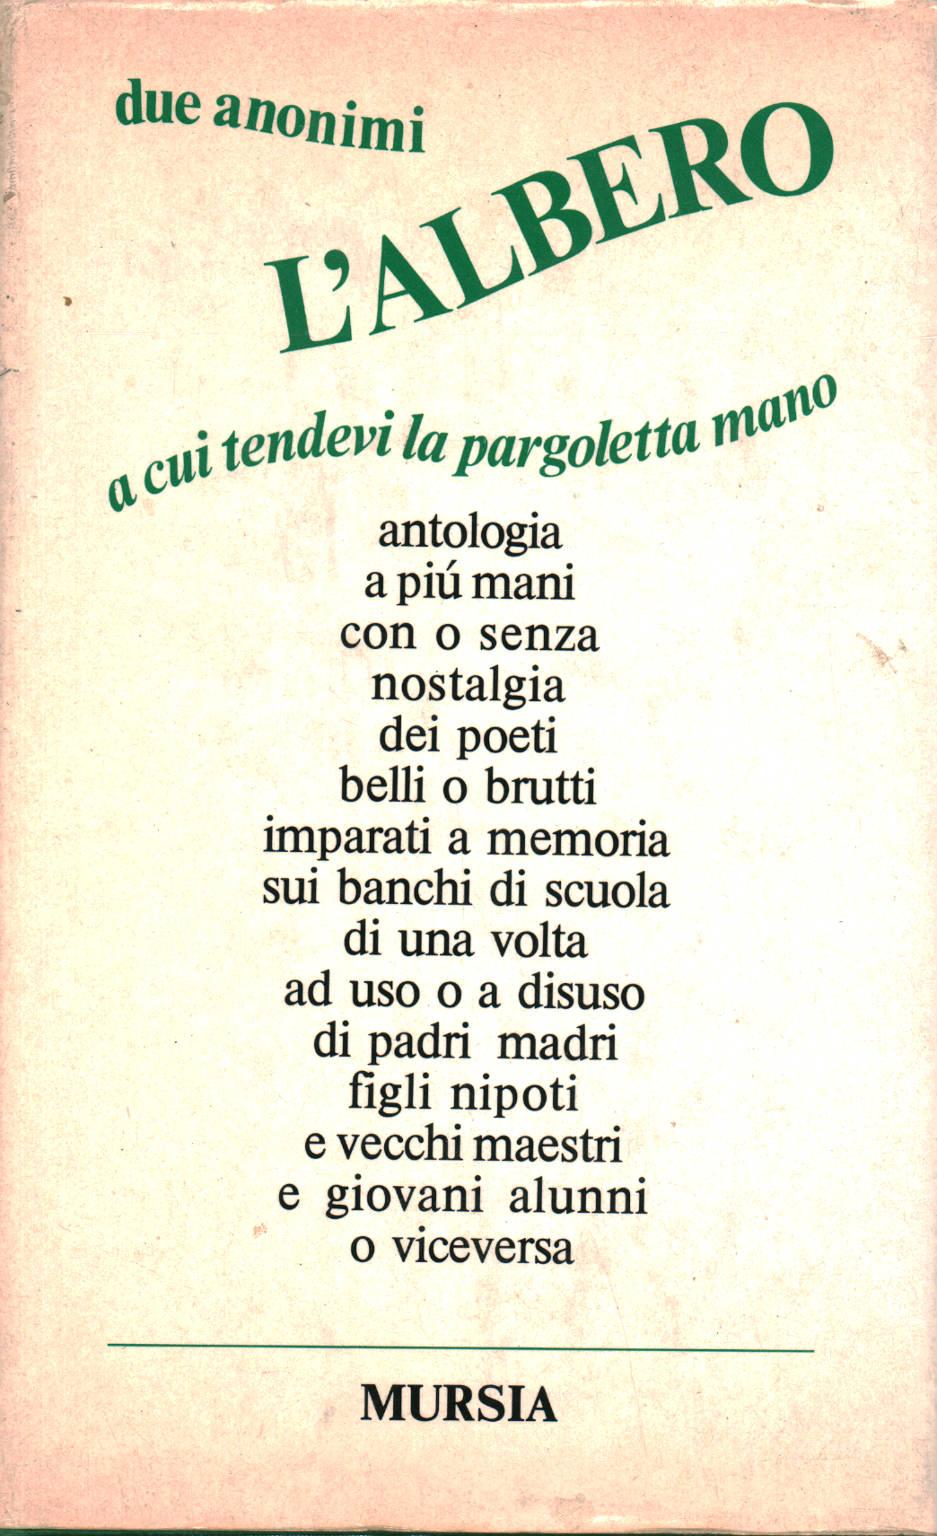 https://www.dimanoinmano.it/de/cp144965/poesia/poesia-italiana ...